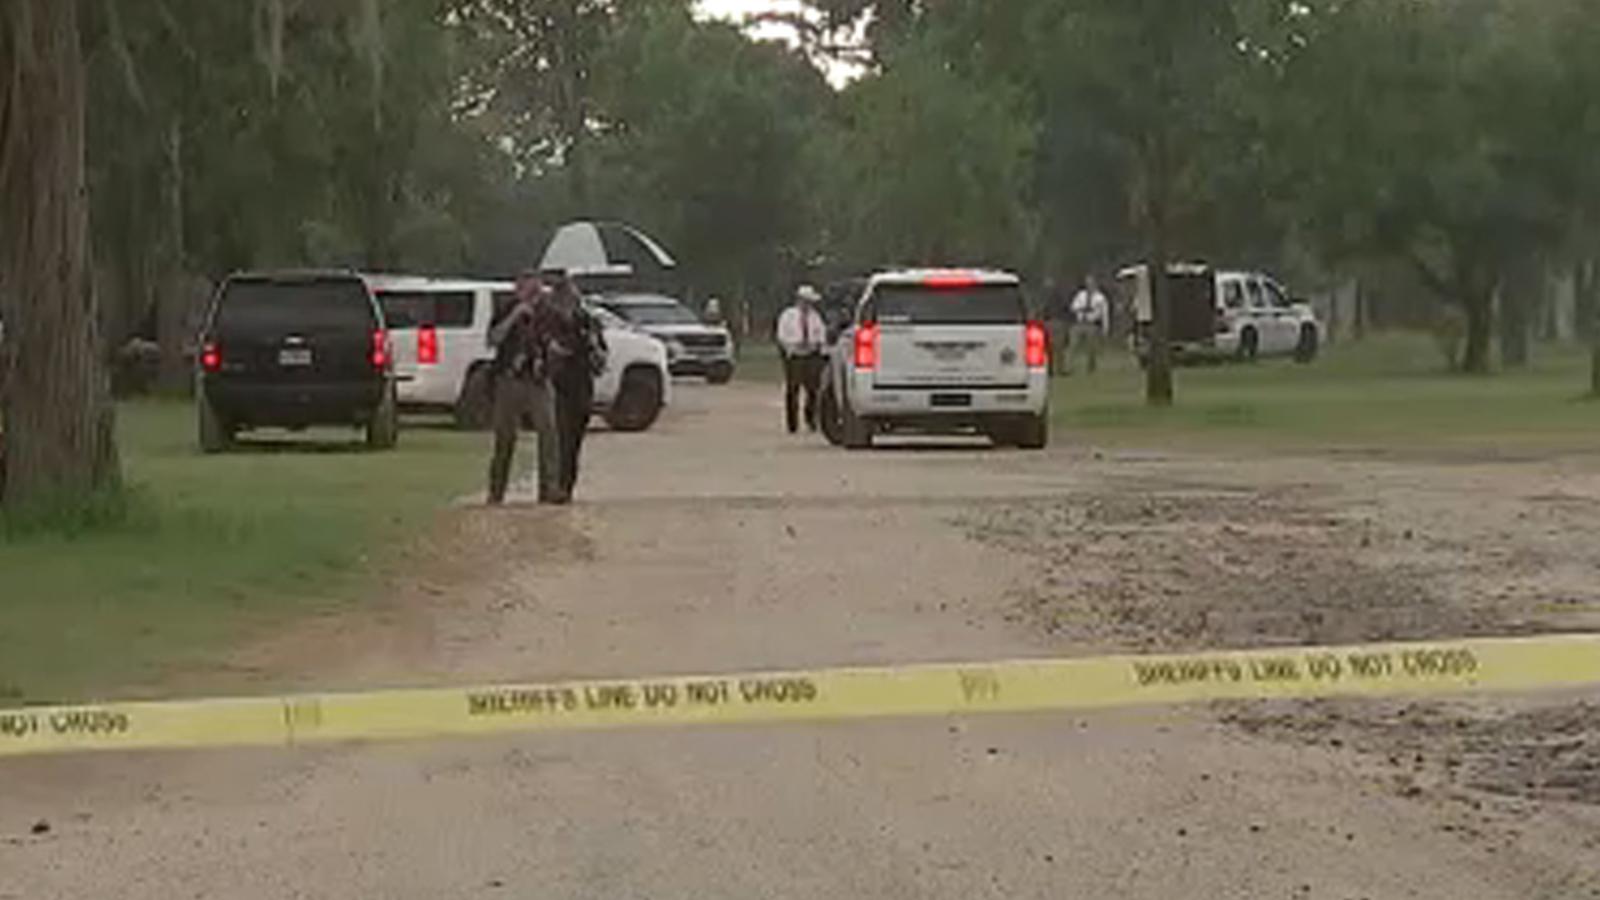 Newborn found dead inside porta-potty in east Harris County, sheriff says